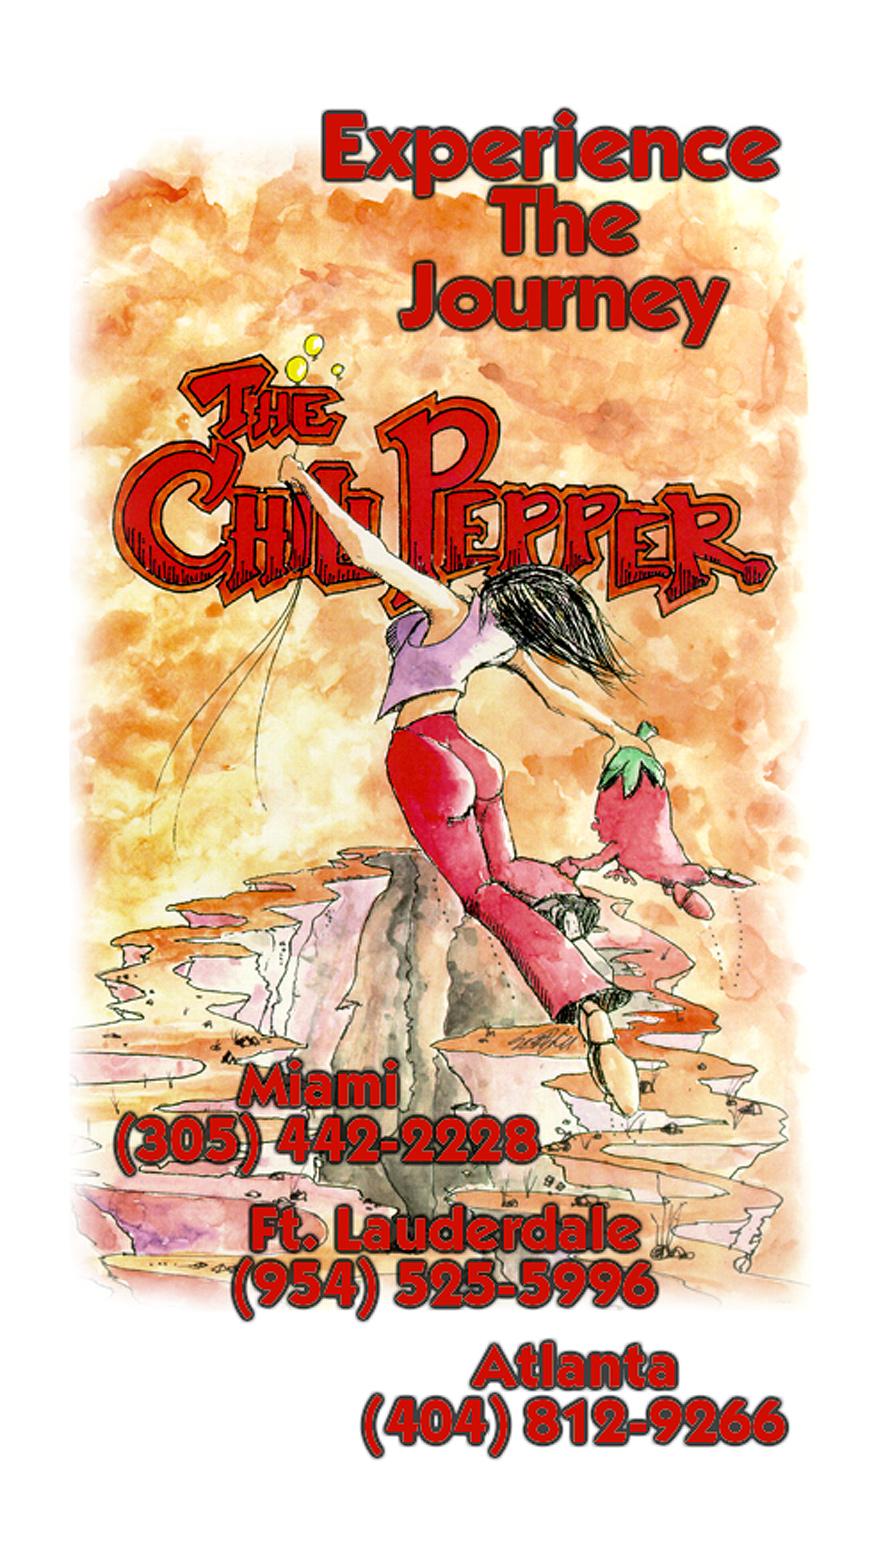 The Chili Pepper Inc. Corporate Office